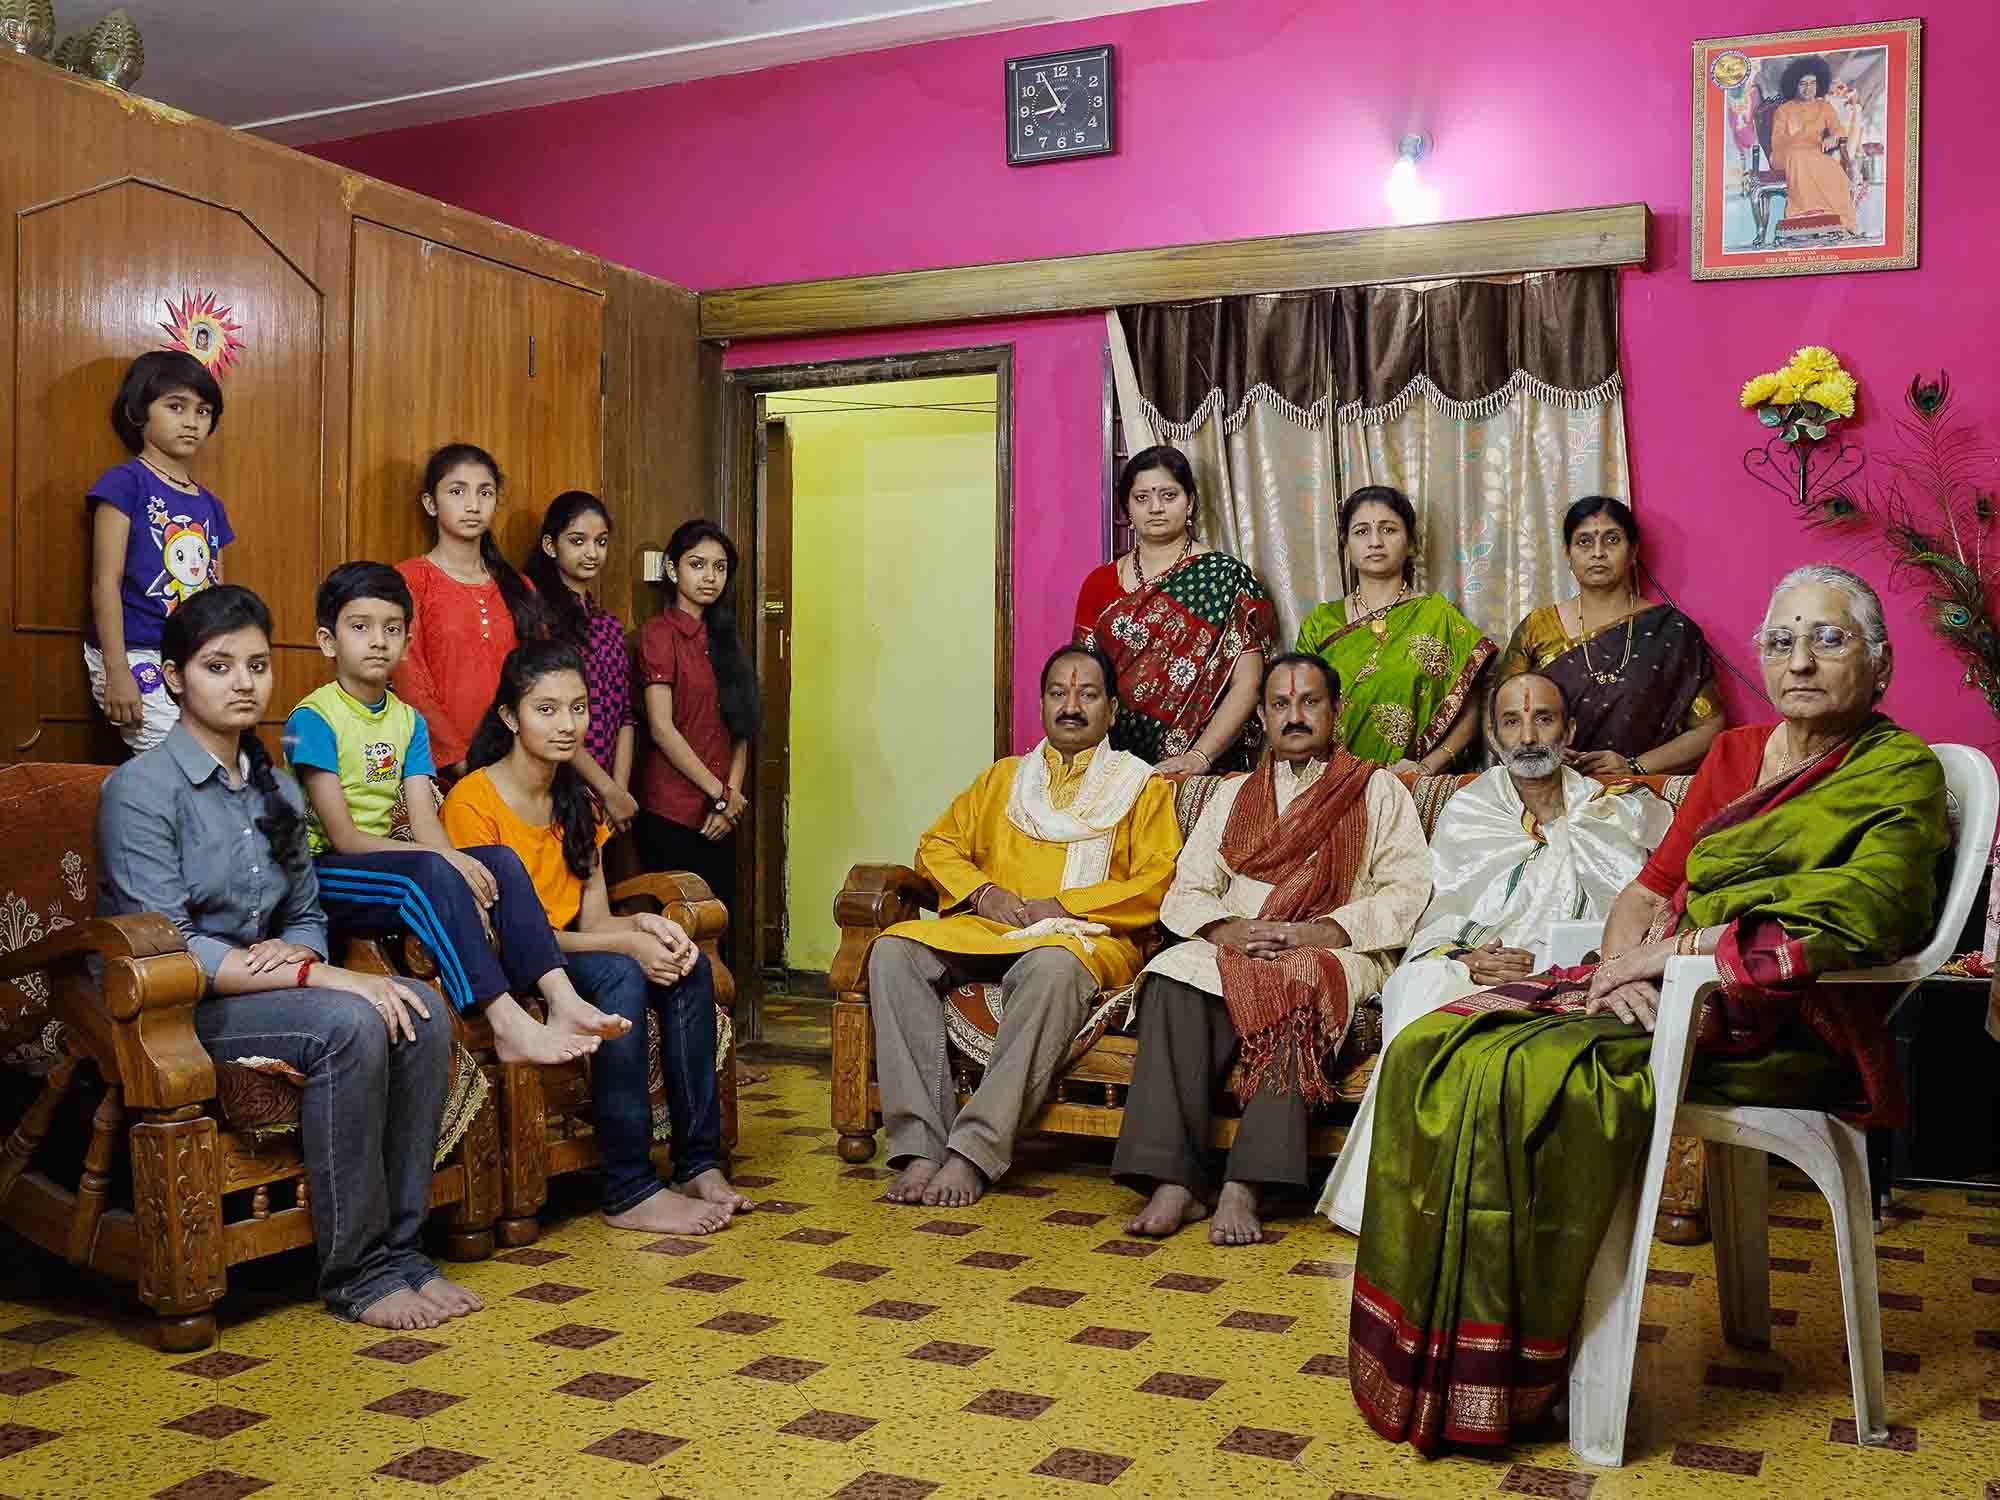 Nora Bibel, Pissay, Bangalore, Indien, 2015. Aus der Serie Family Comes First